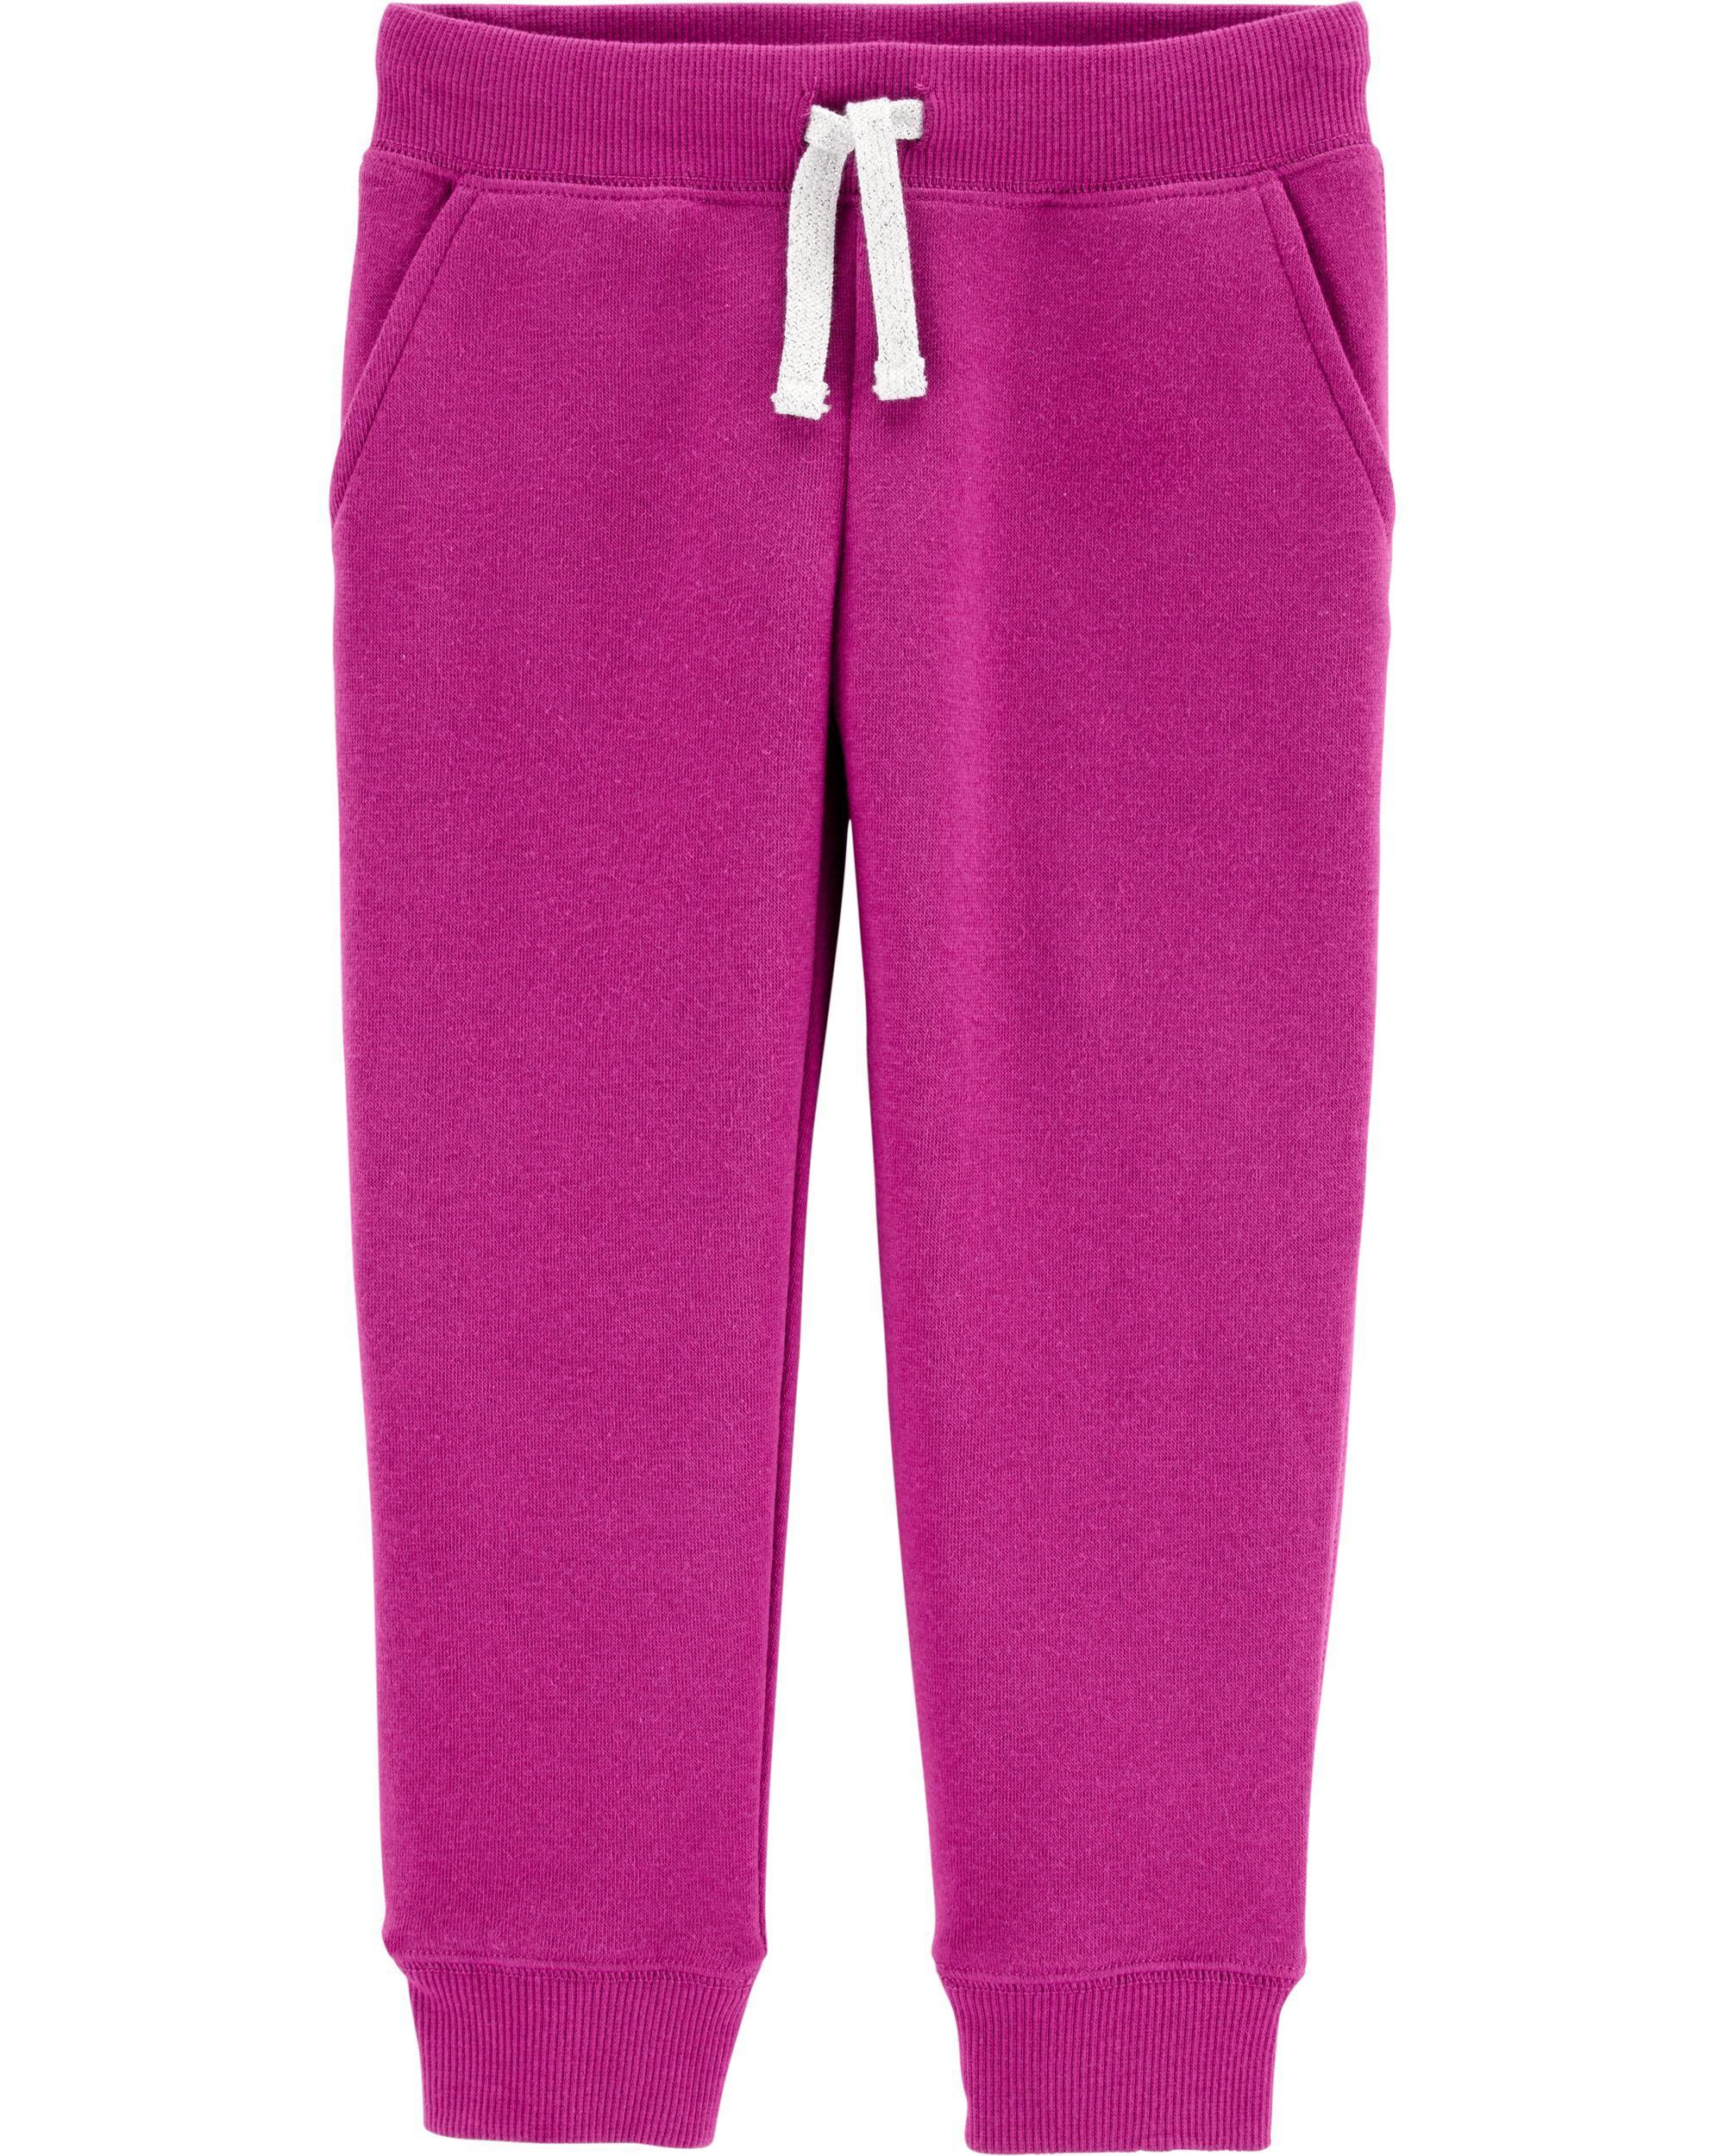 Carters Little Girls Fleece Active Pants